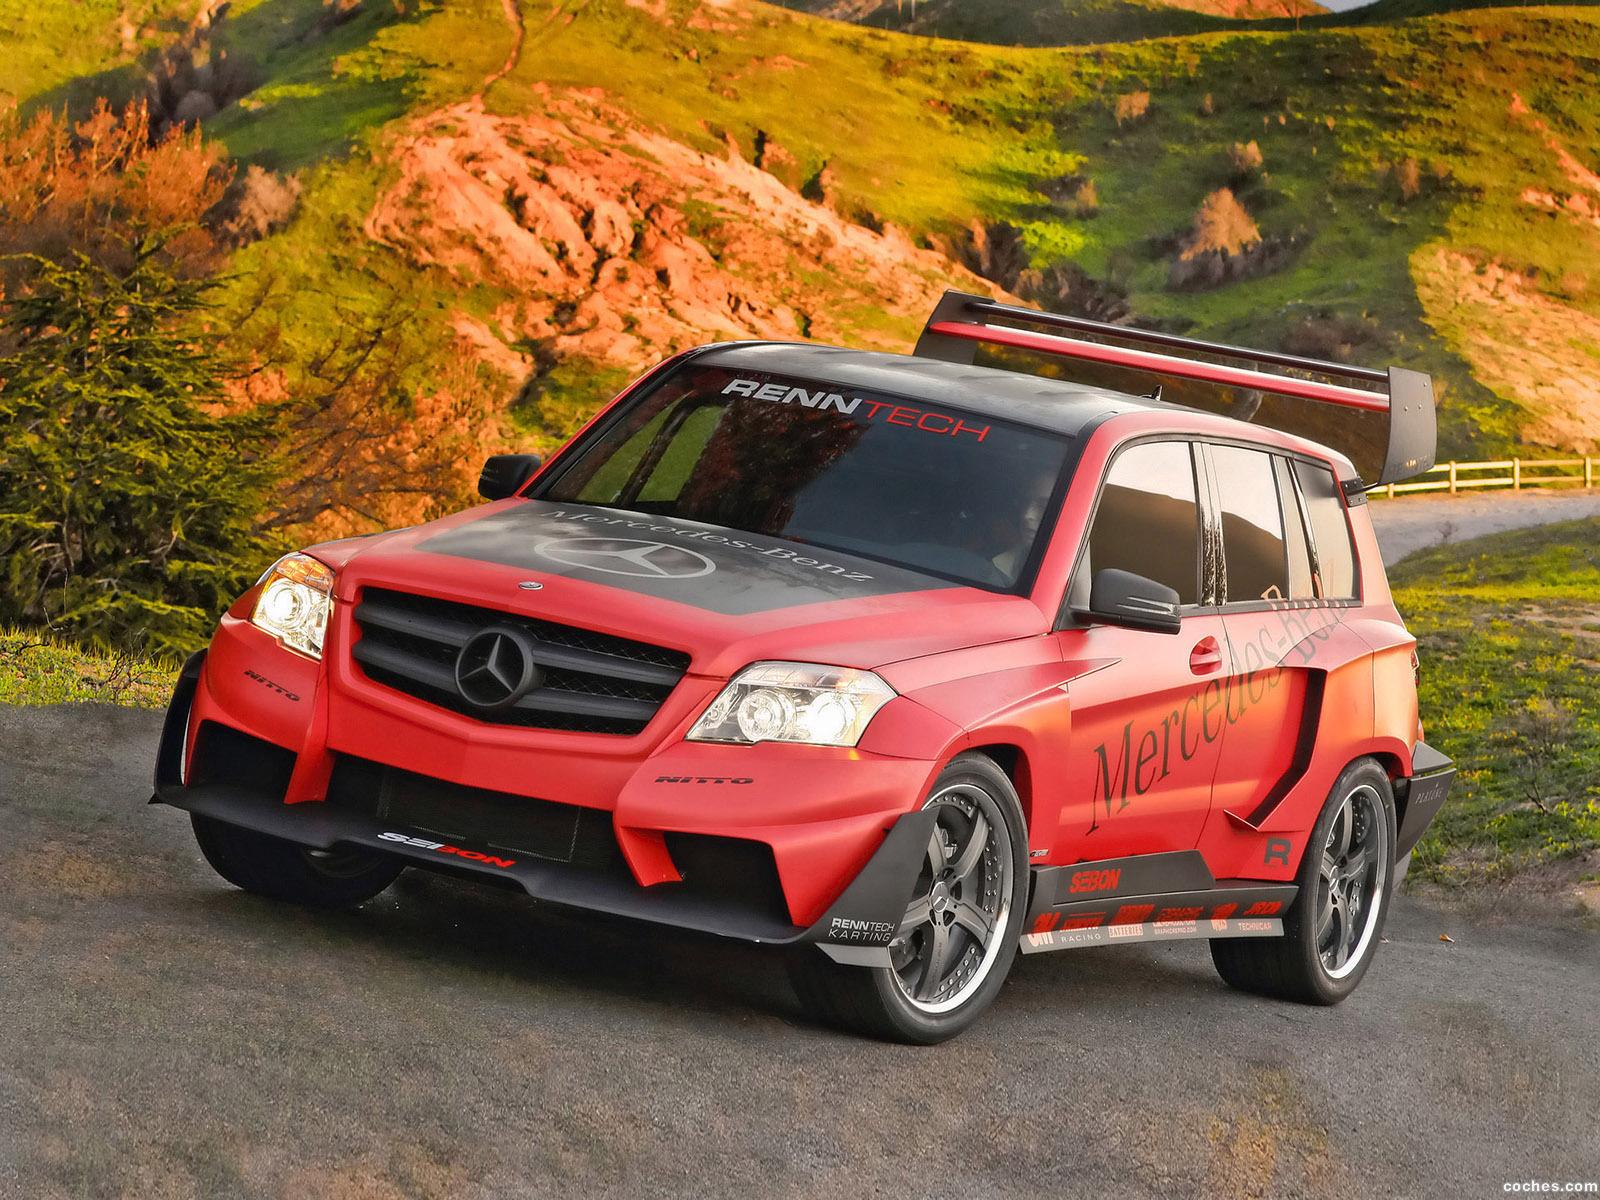 mercedes_glk350-pikes-peak-rally-racer-by-renntech-x204-2008_r5